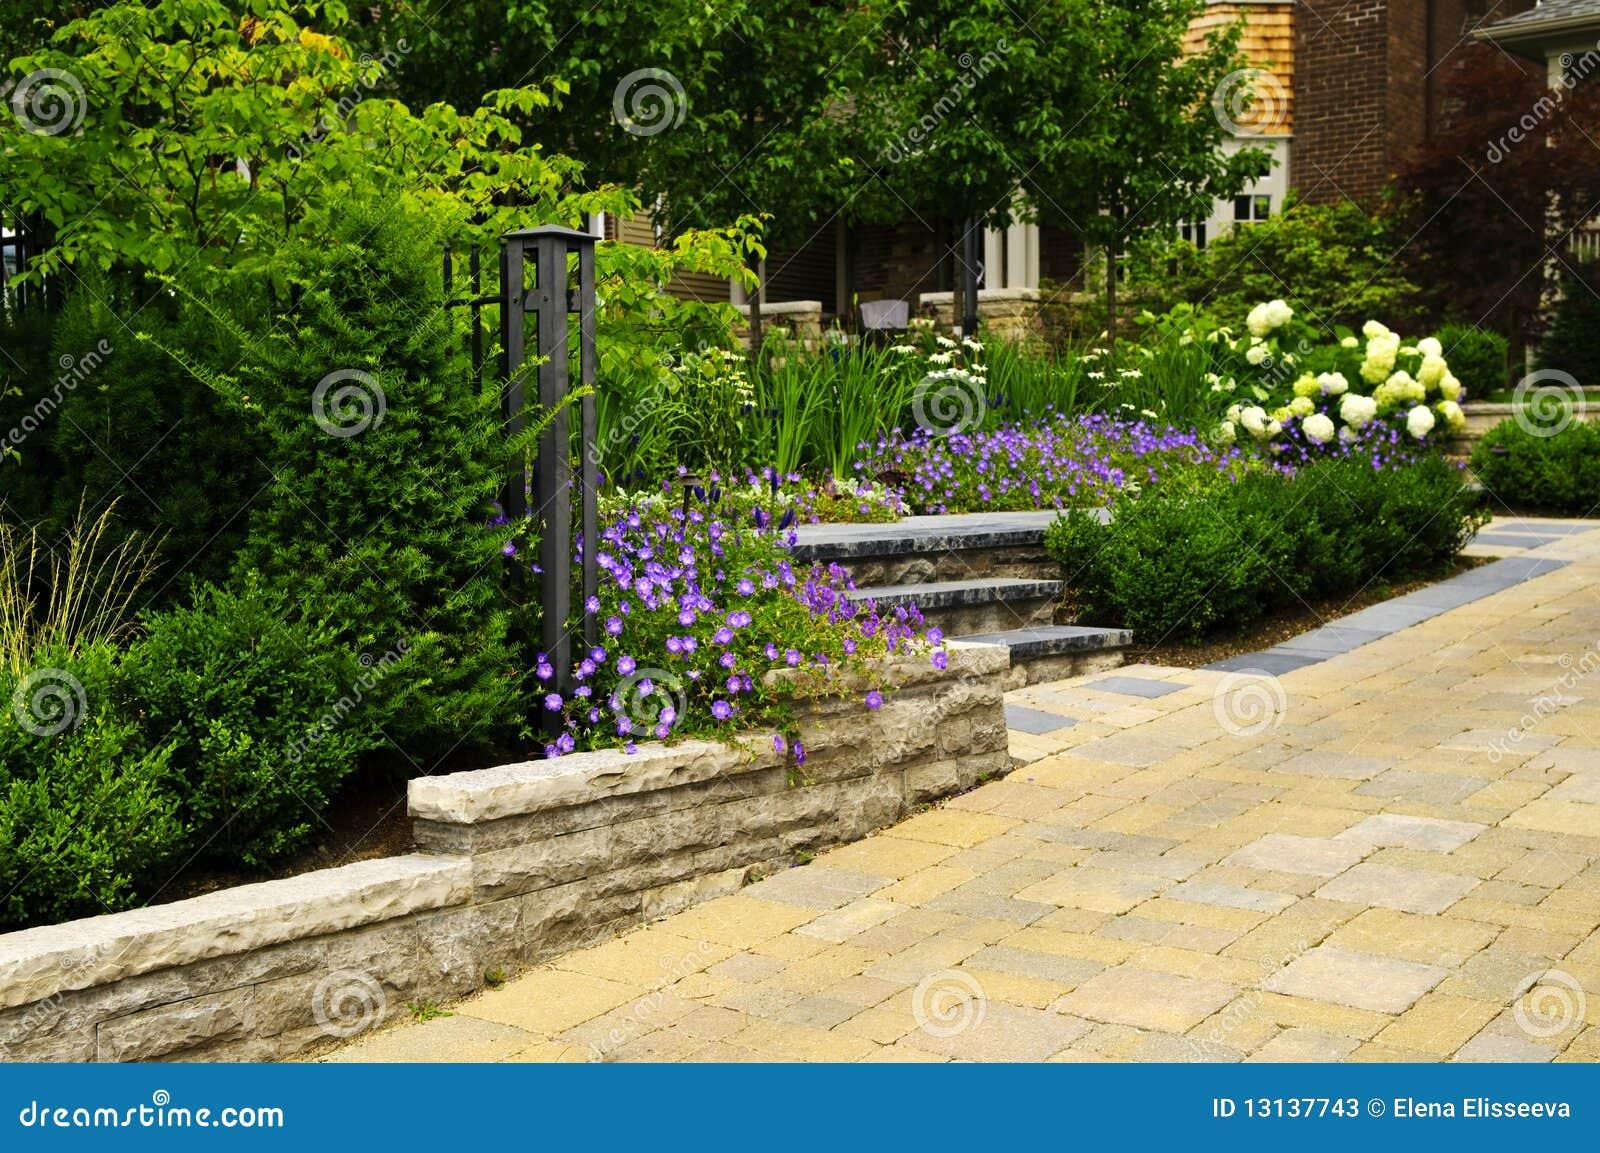 Jardín ajardinado y calzada pavimentada piedra